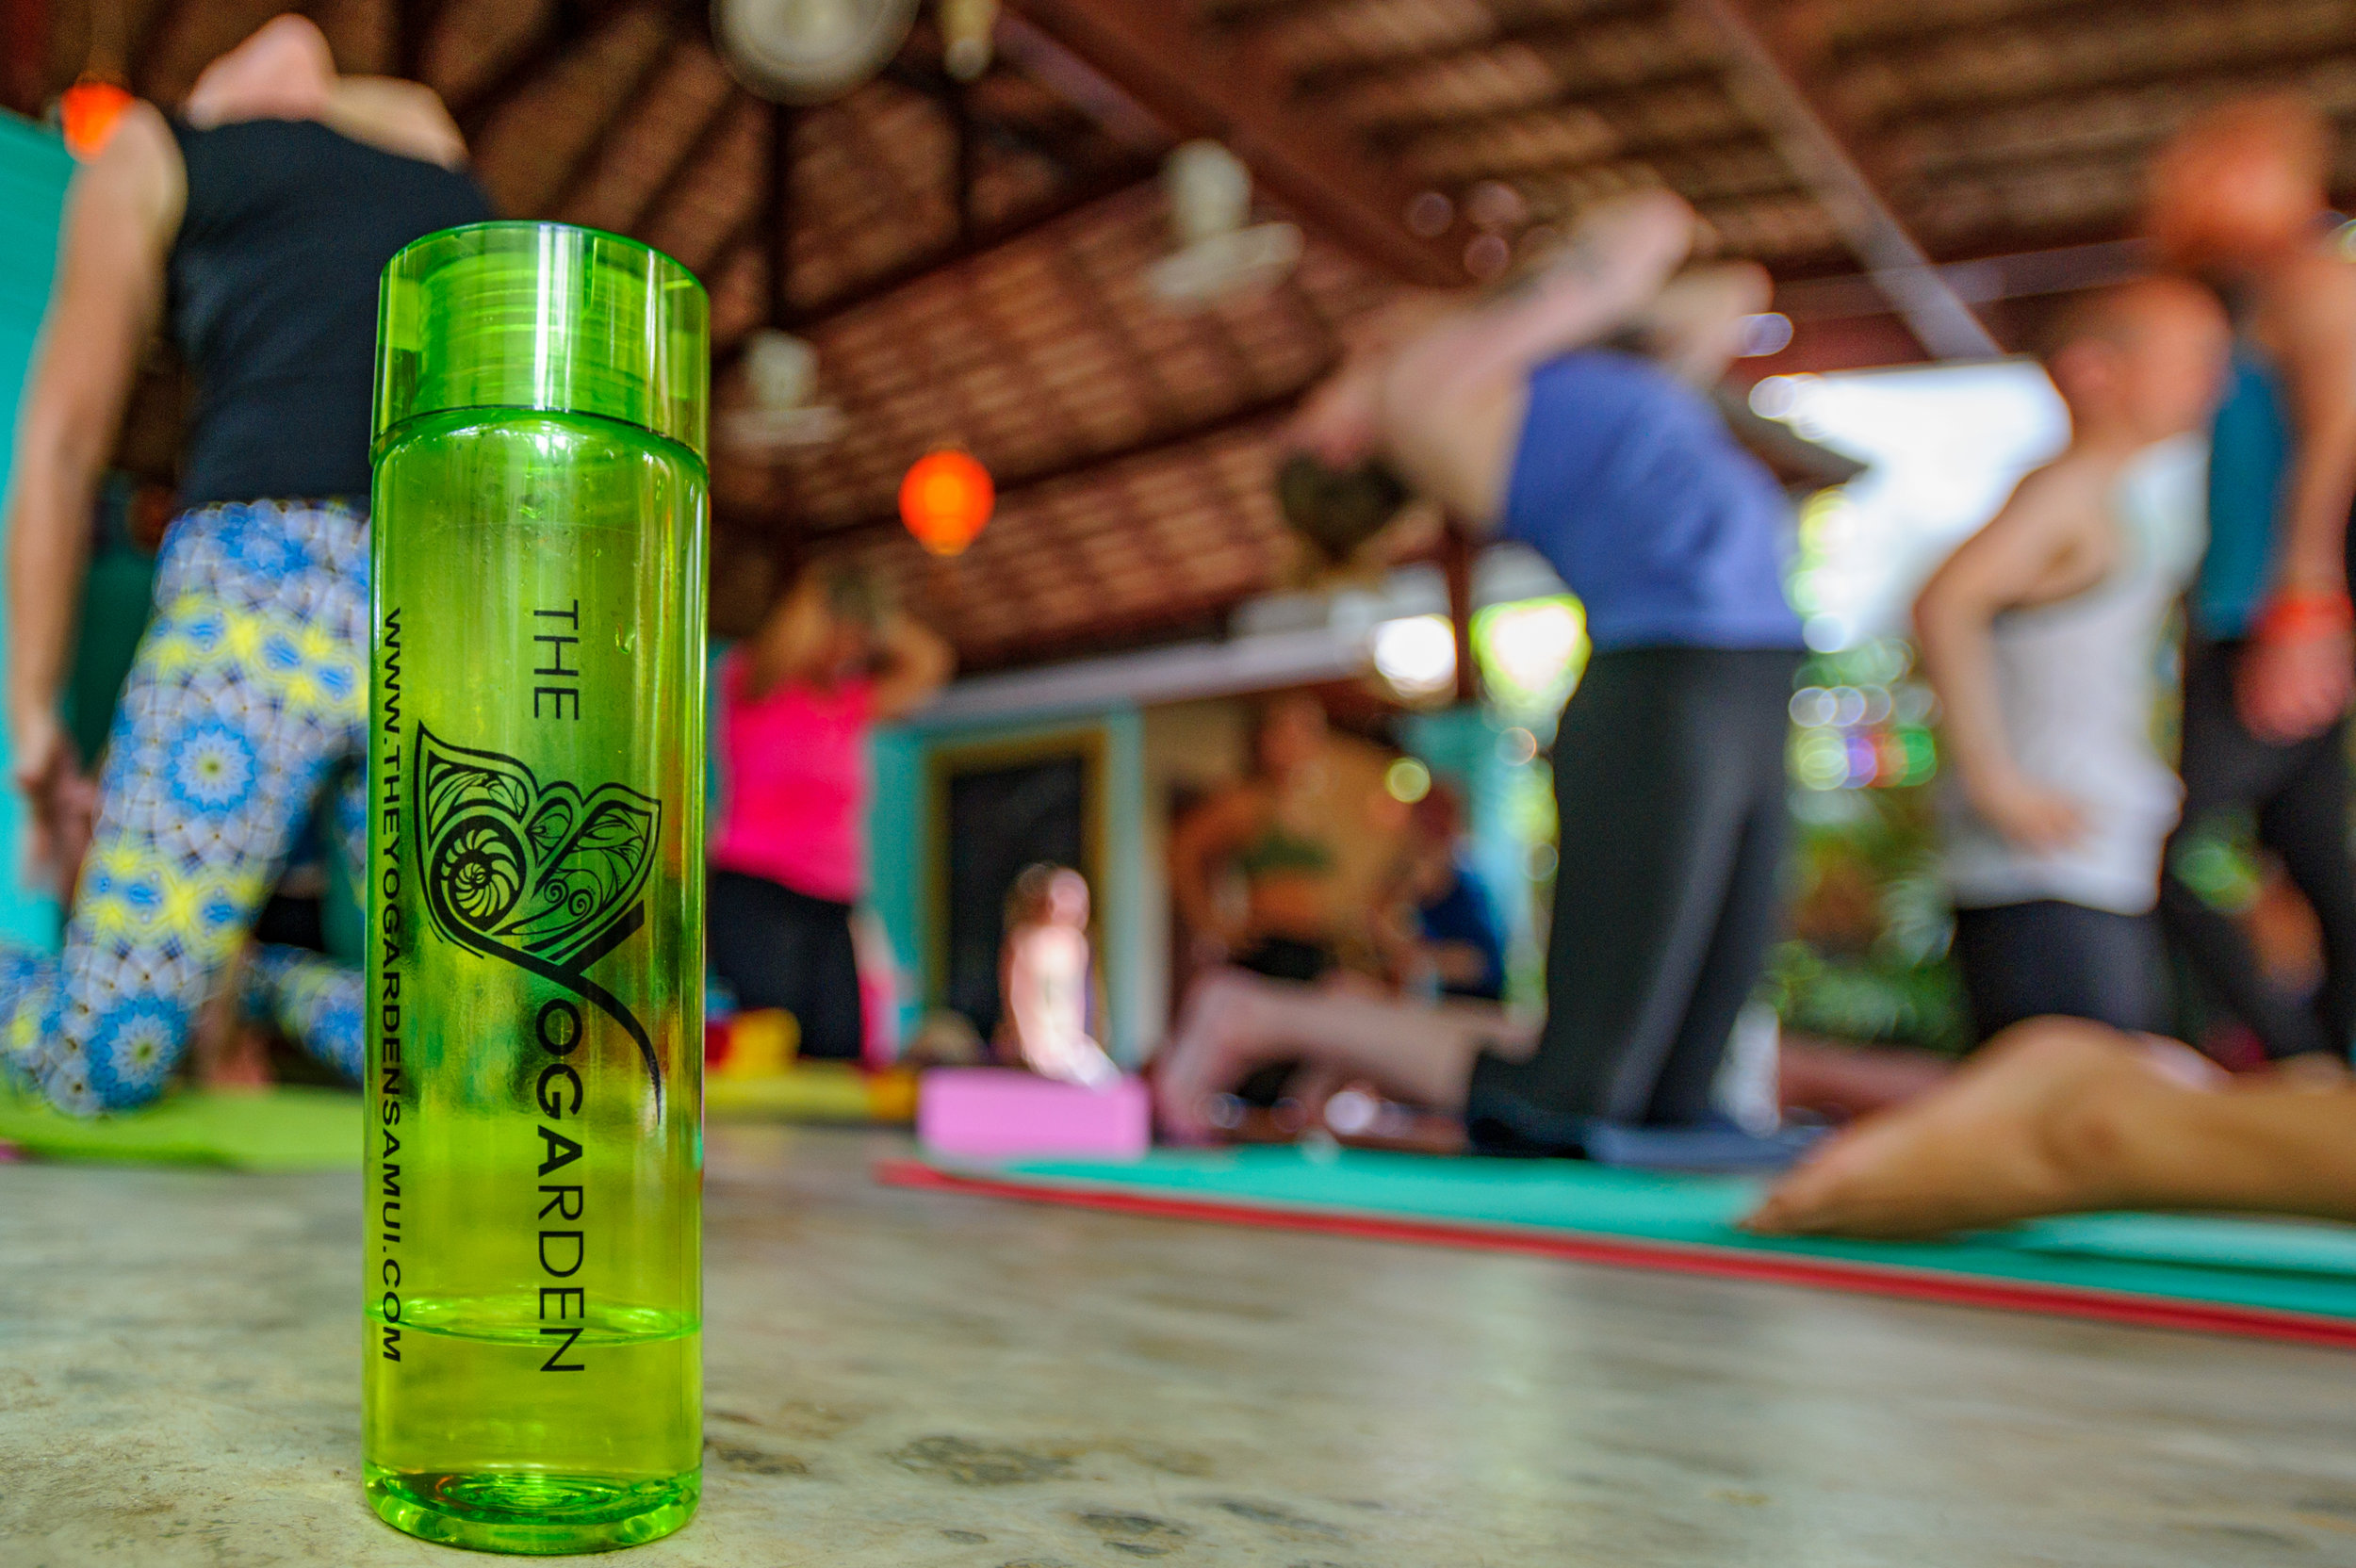 yin yoga 1(100hrs) - KOH SAMUI, THAILAND